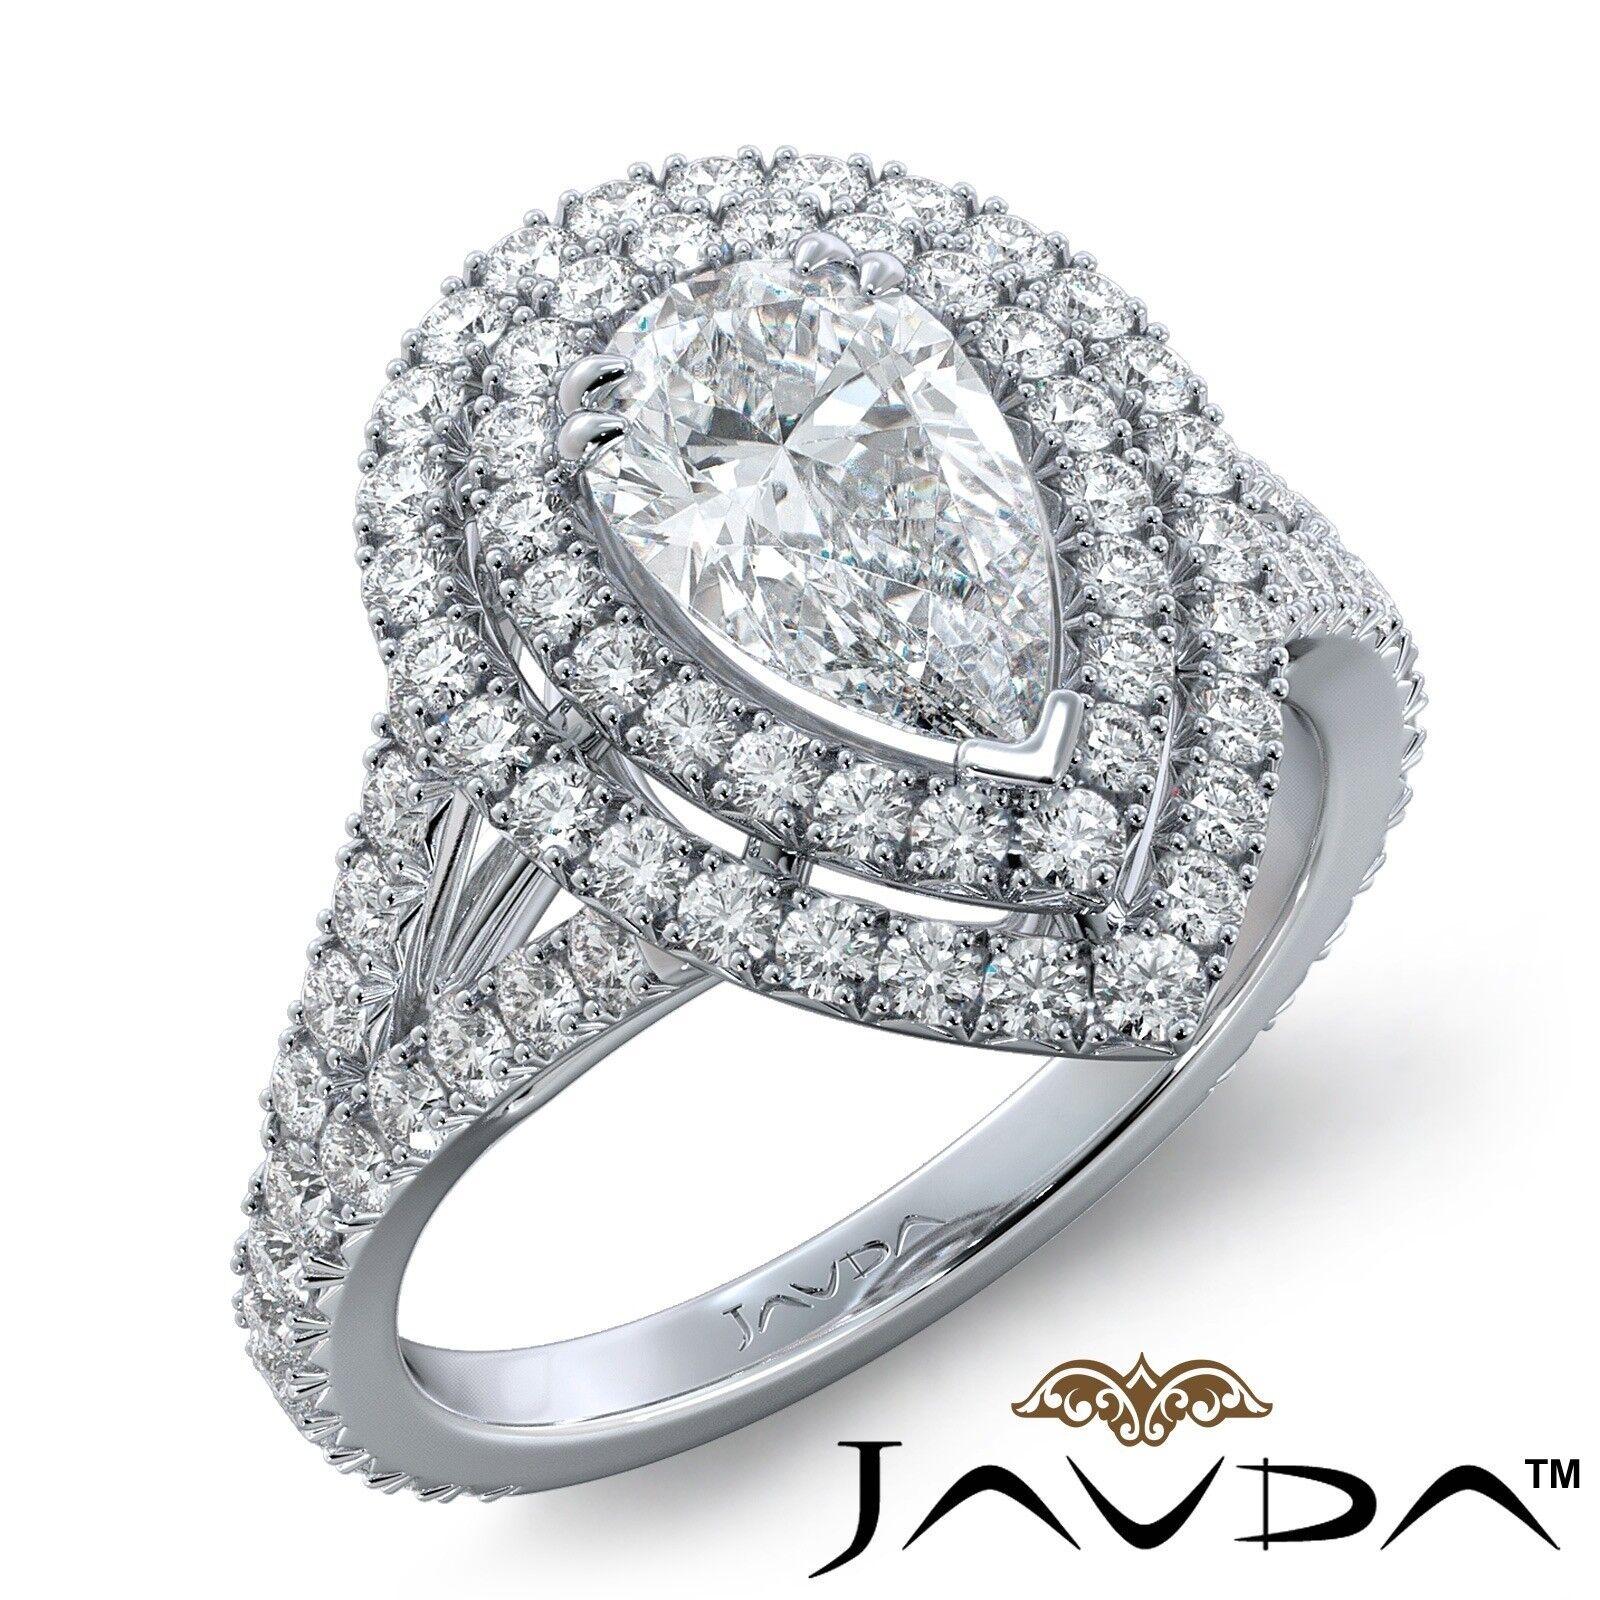 2.12ct Double Halo Split Shank Pear Diamond Engagement Ring GIA E-SI1 White Gold